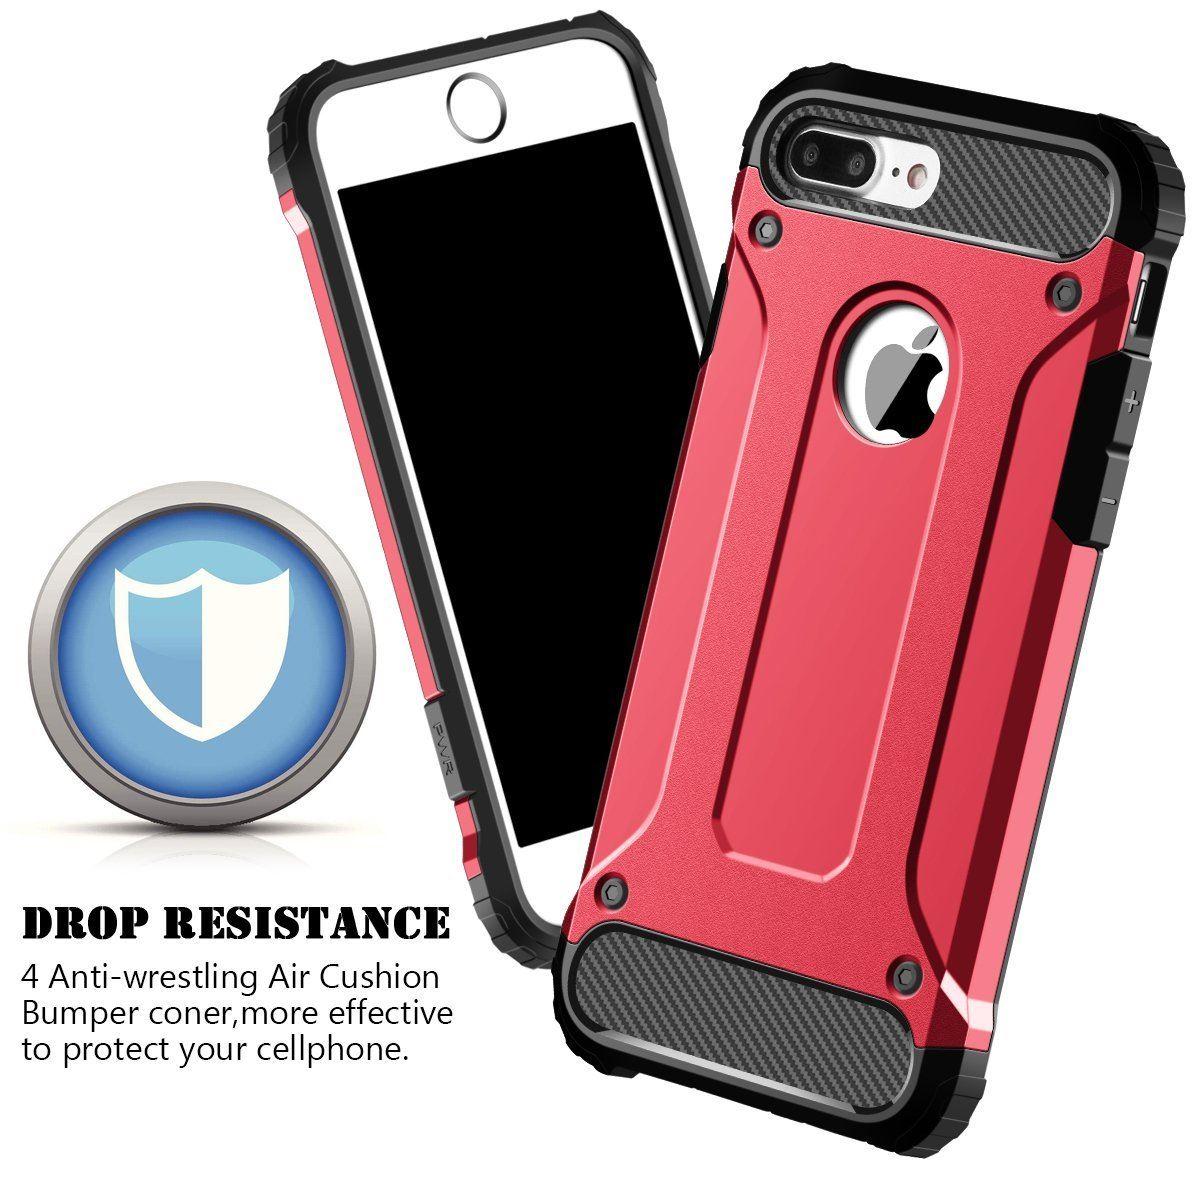 thumbnail 17 - For Apple iPhone 11 Pro Max XR Xs X 8 7 Plus 6 5 Se Case Cover Impact Heavy Duty